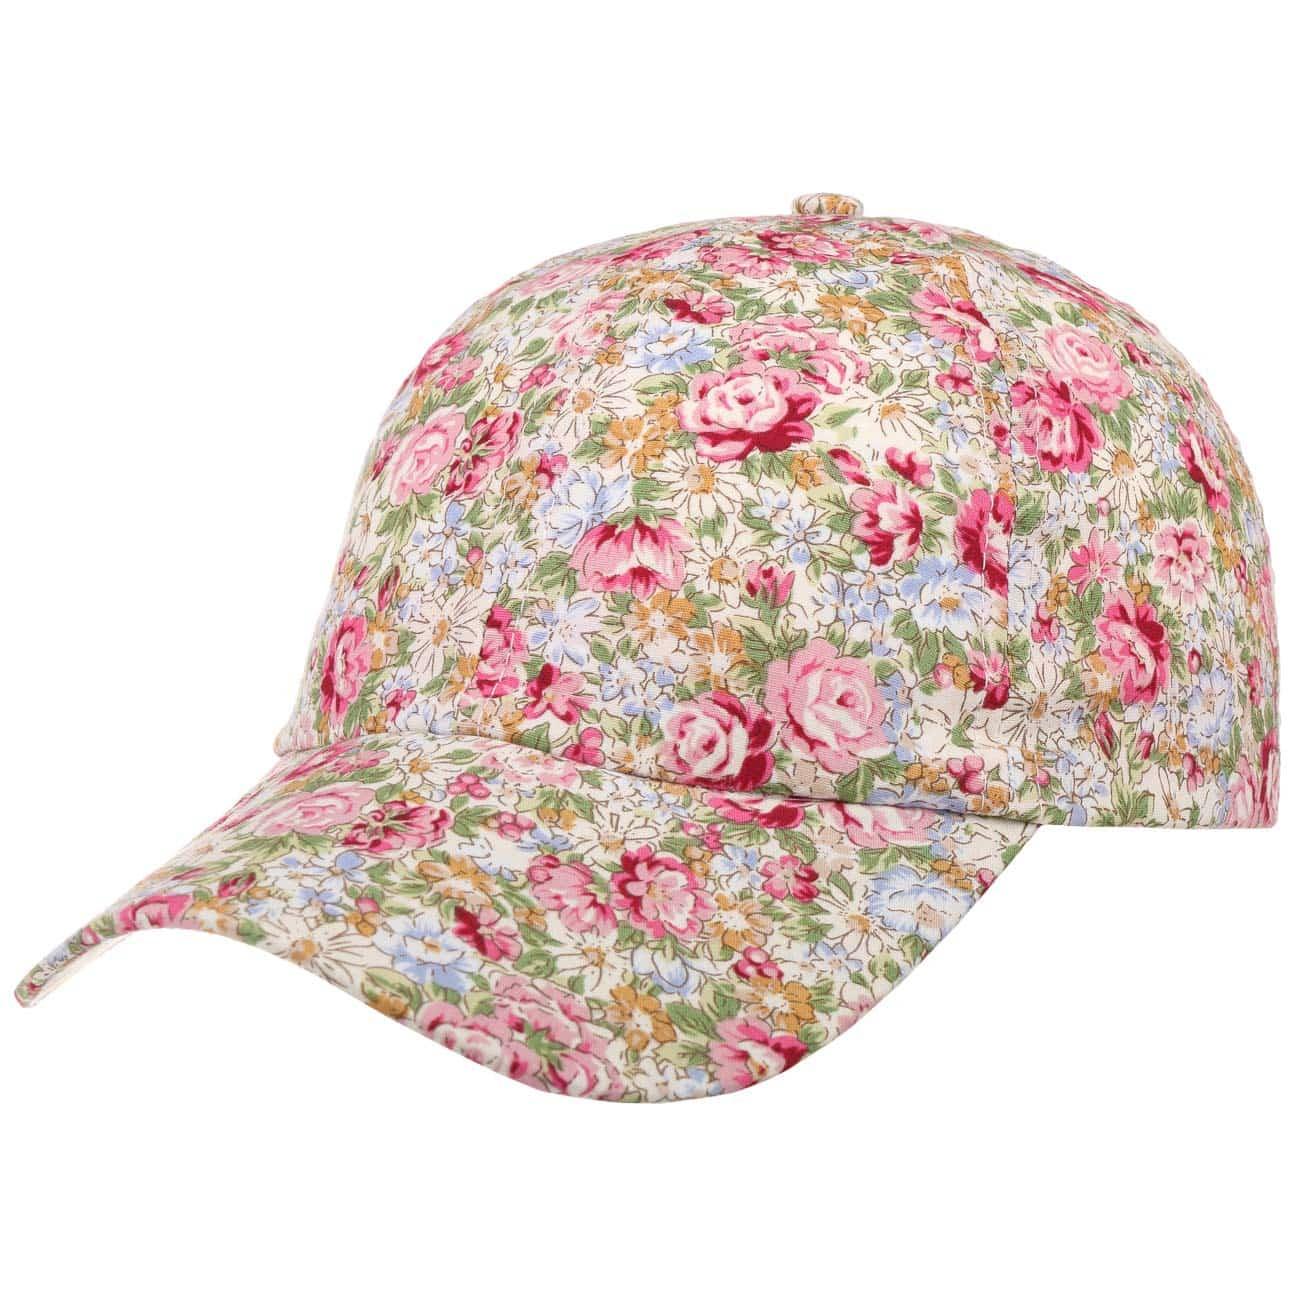 Casquette Allover Flowers by Lipodo  casquette pour femme